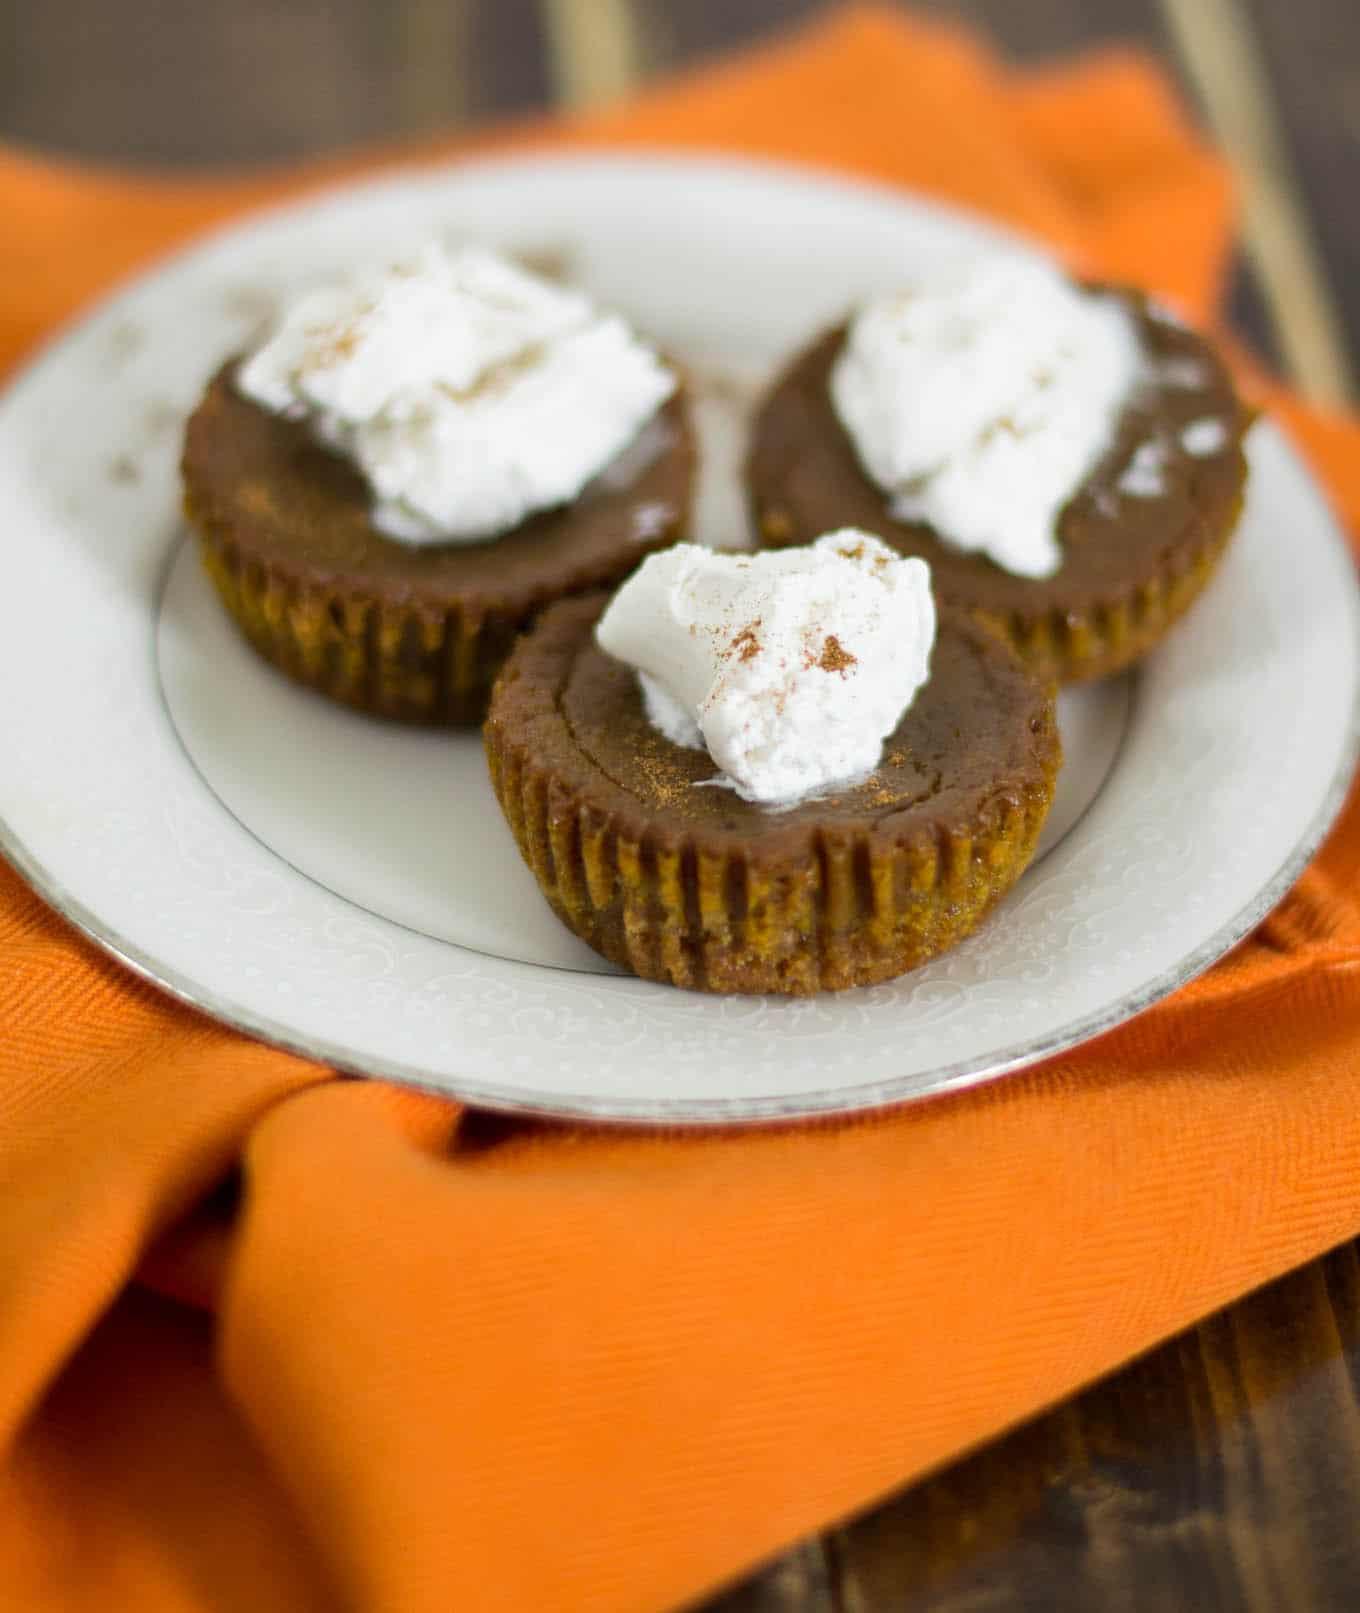 Graham Cracker Crust Pumpkin Pie  Mini Vegan Pumpkin Pies recipe with Homemade Graham